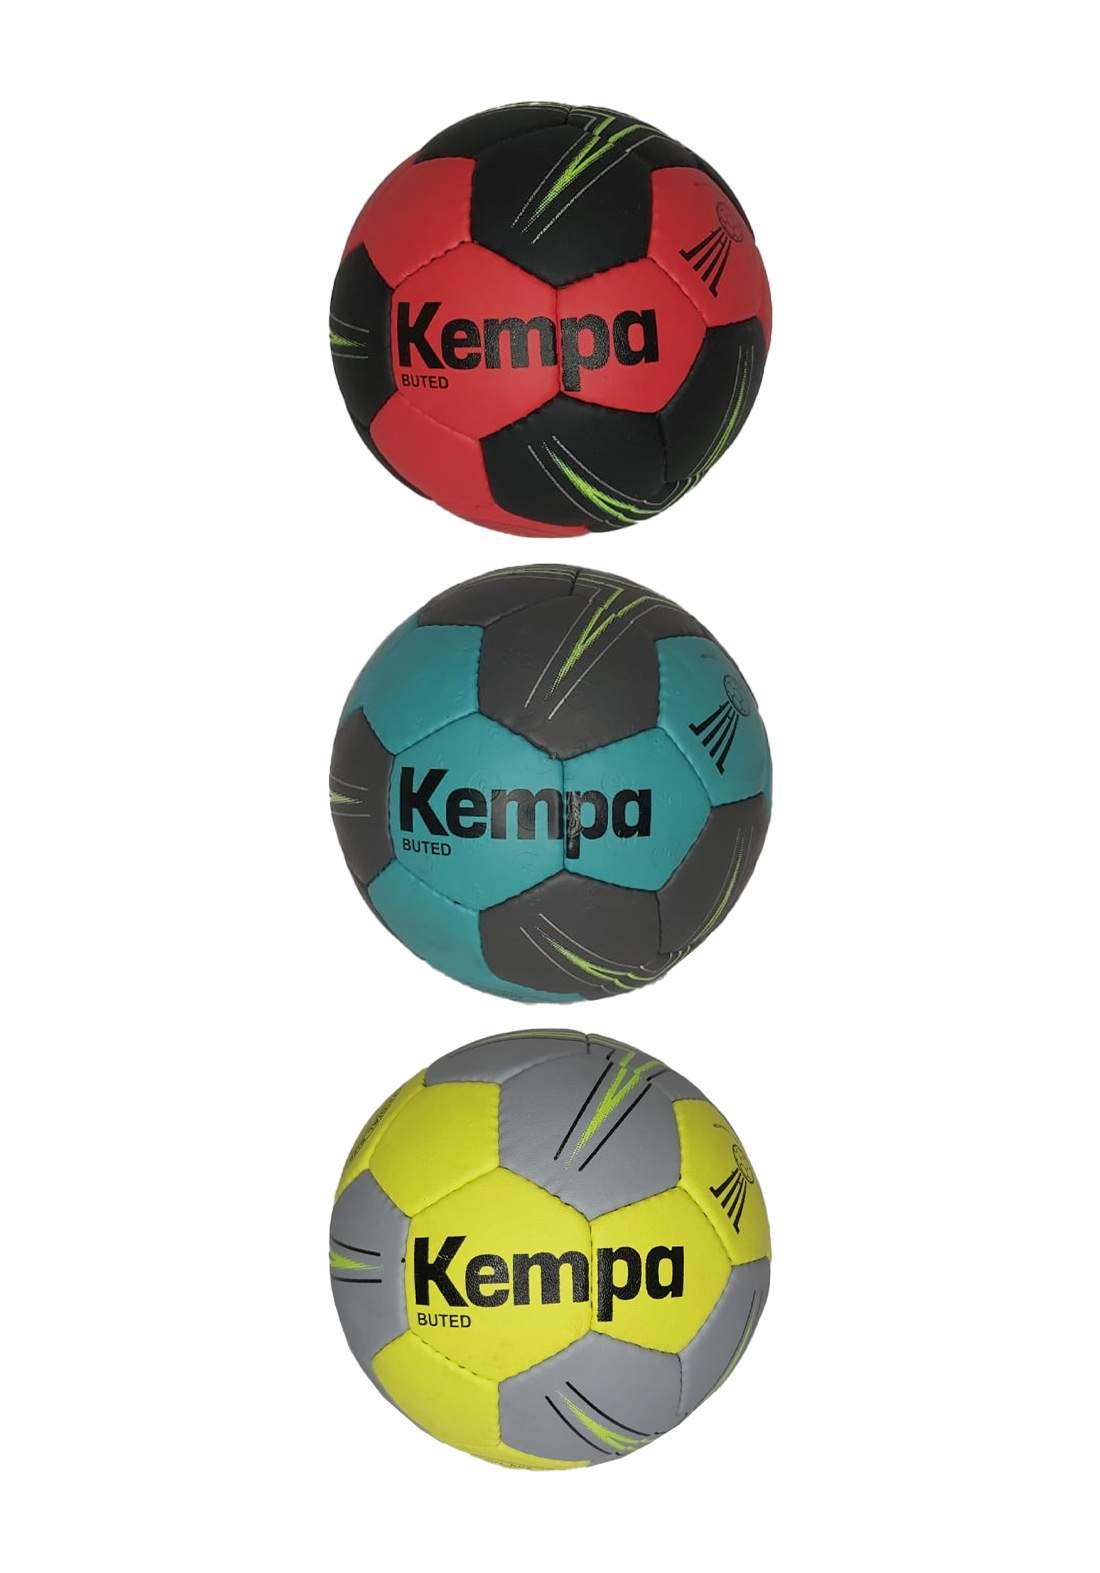 Kempa Buted Handballكرة اليد